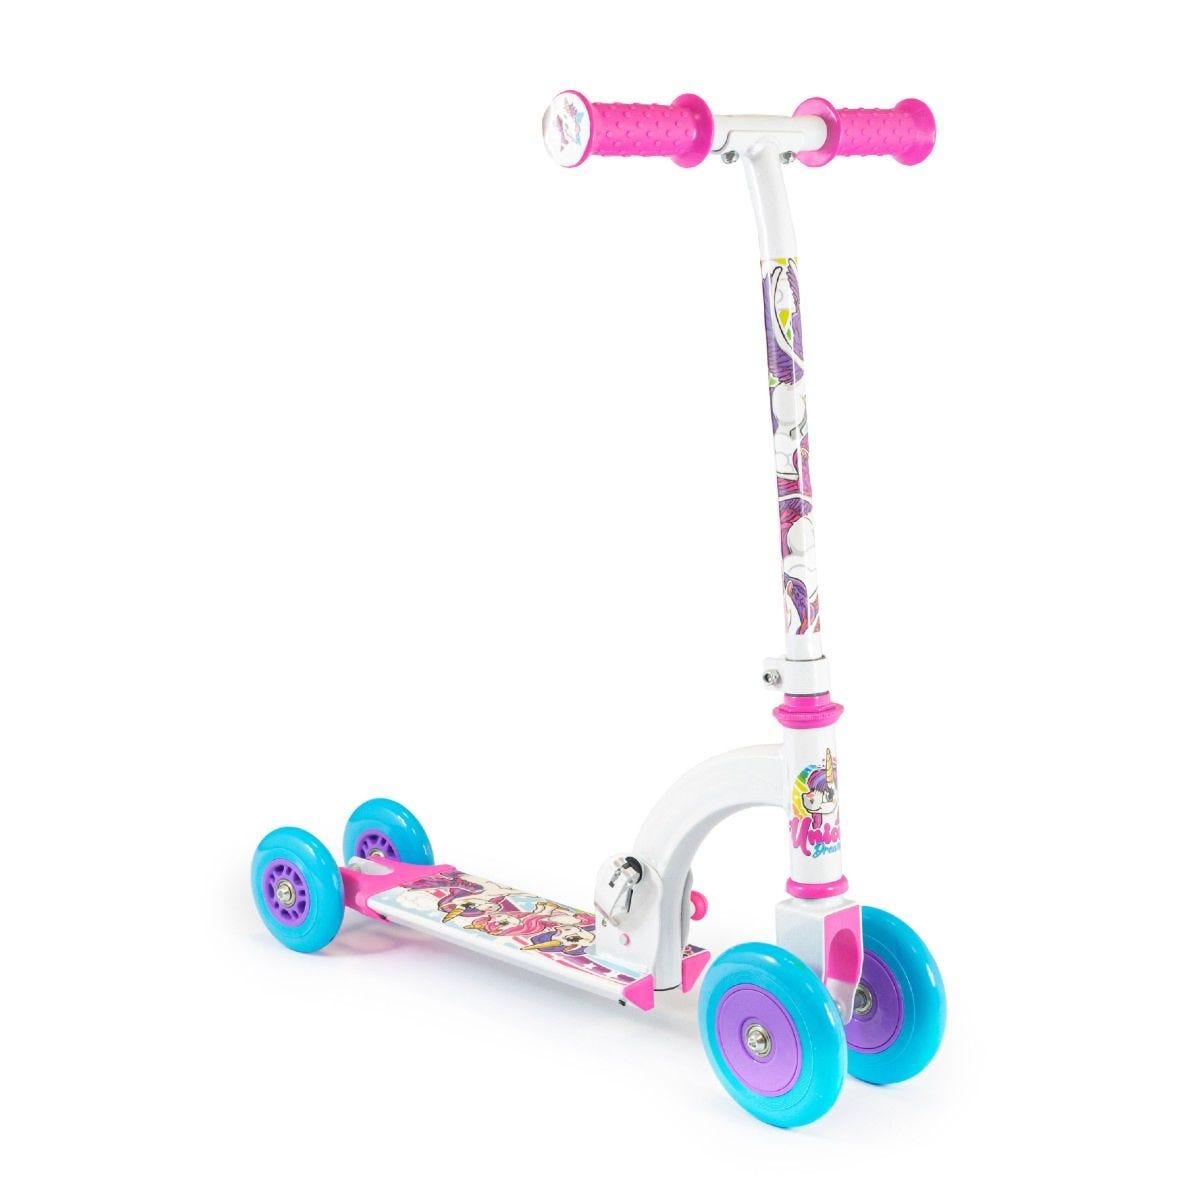 Ozbozz Unicorn My First Scooter